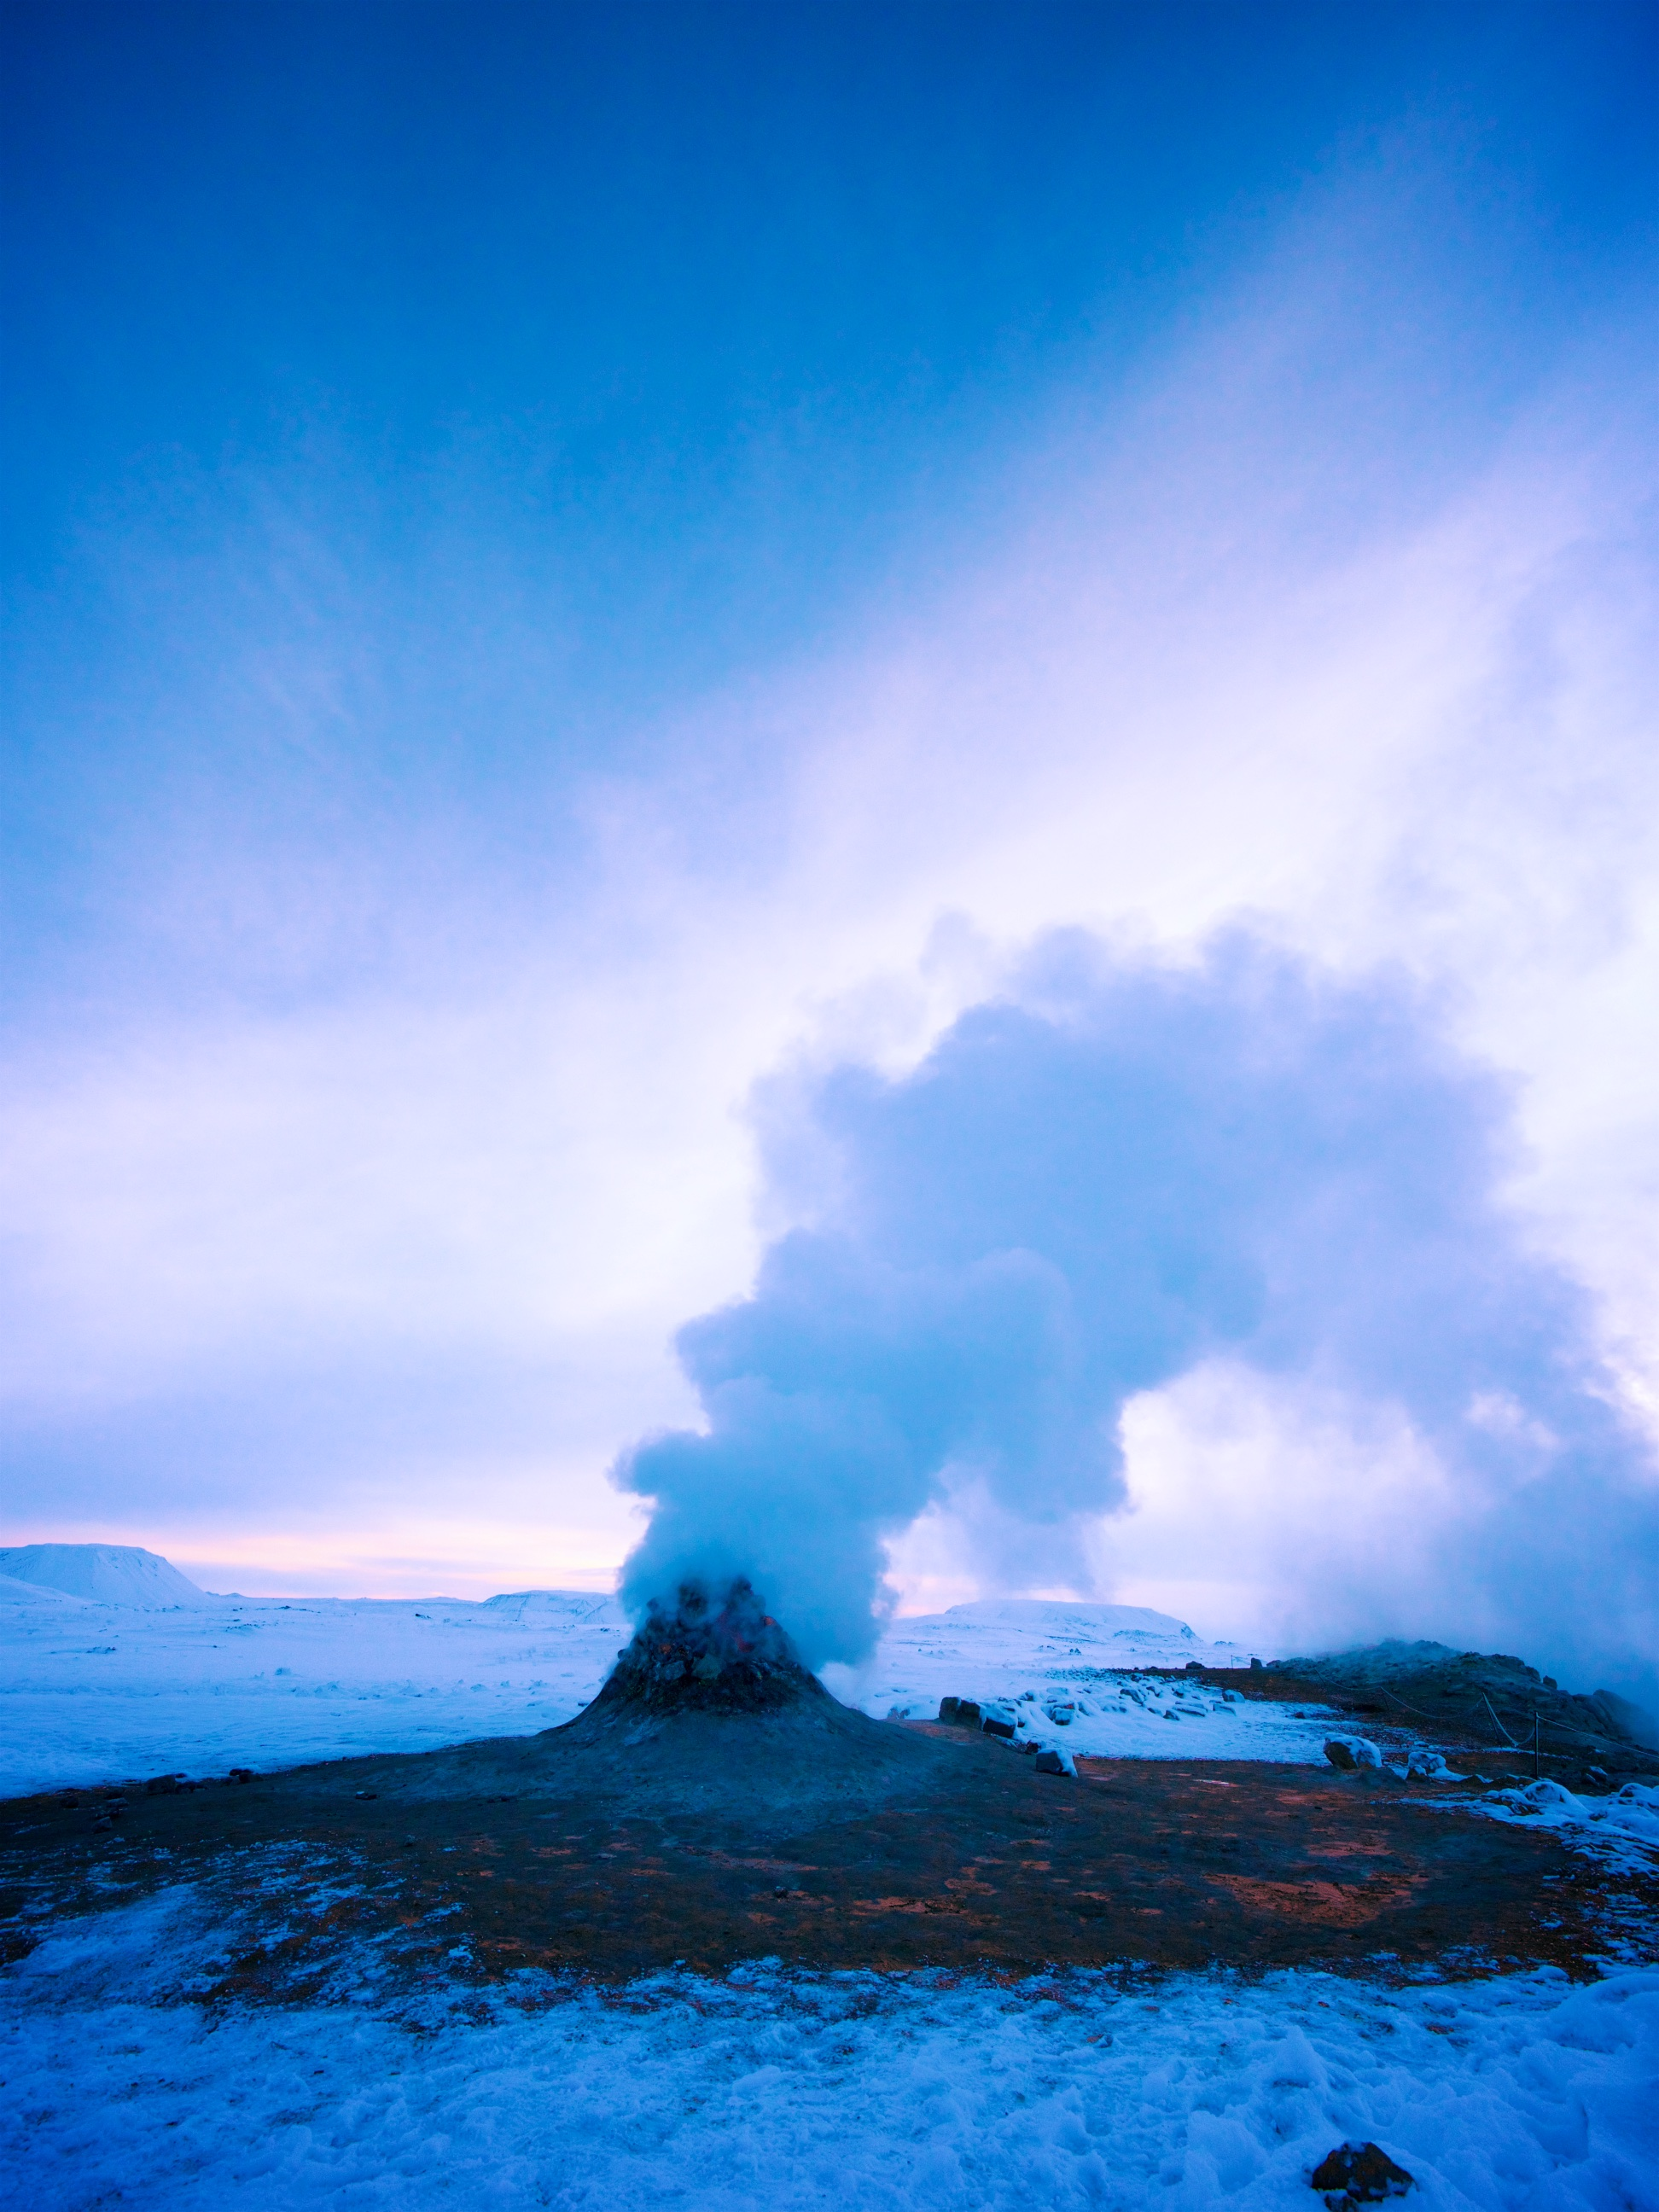 Fumarole, Iceland (non-anthropogenic GHG emissions)